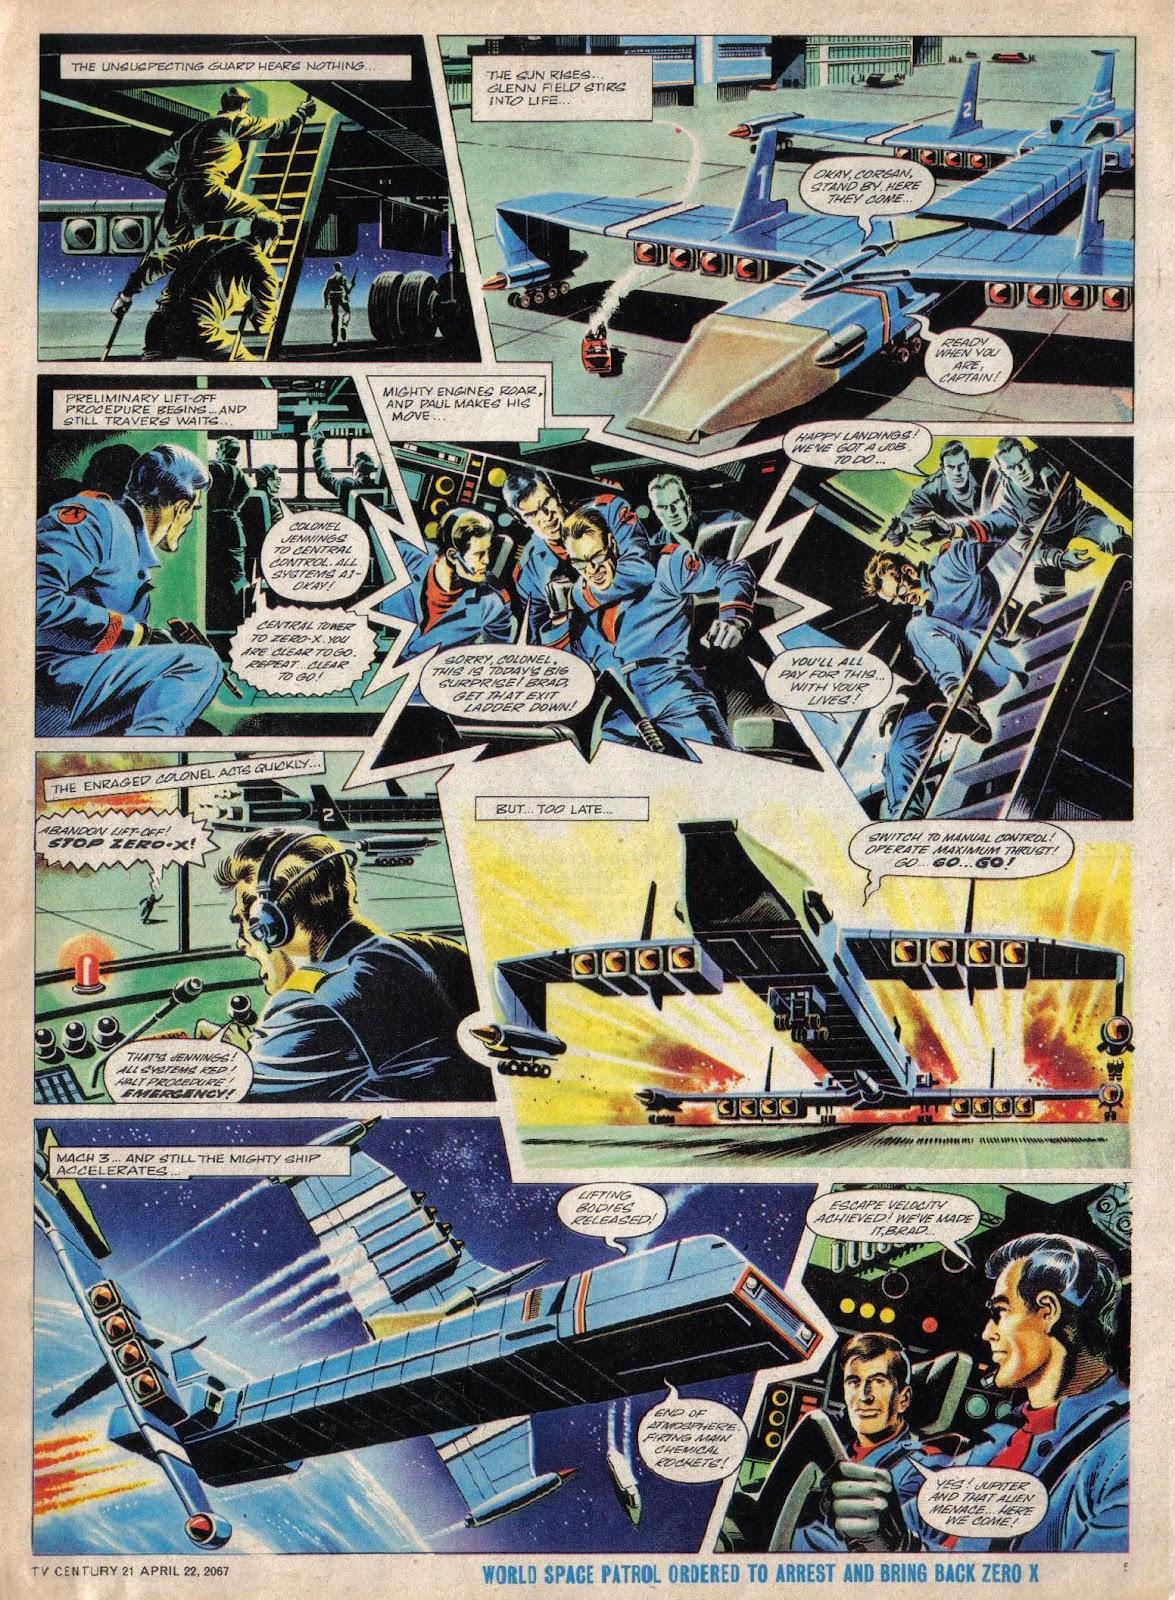 TV Century 21 (TV 21) issue 118 - Page 5